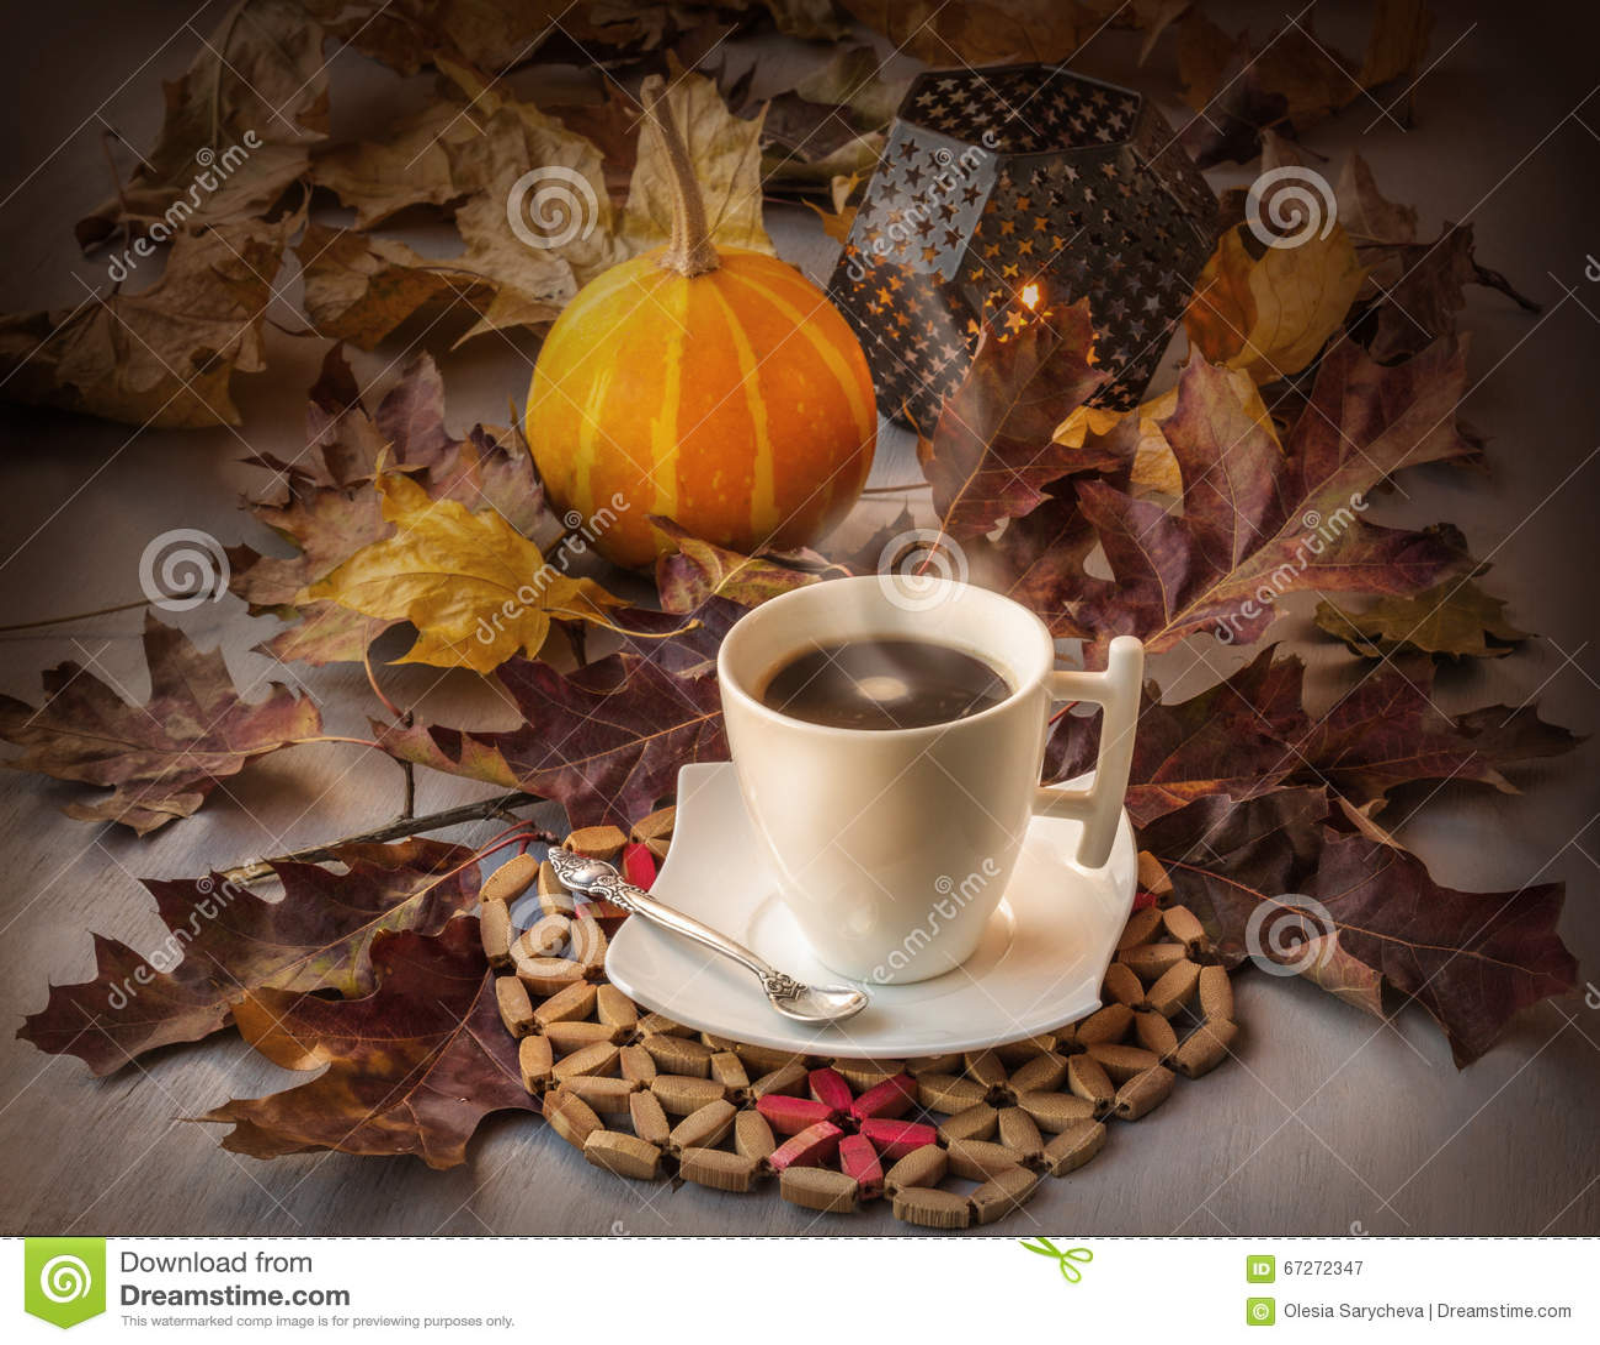 Cup Of Coffee On Halloween Stock Photo - Image: 67272347